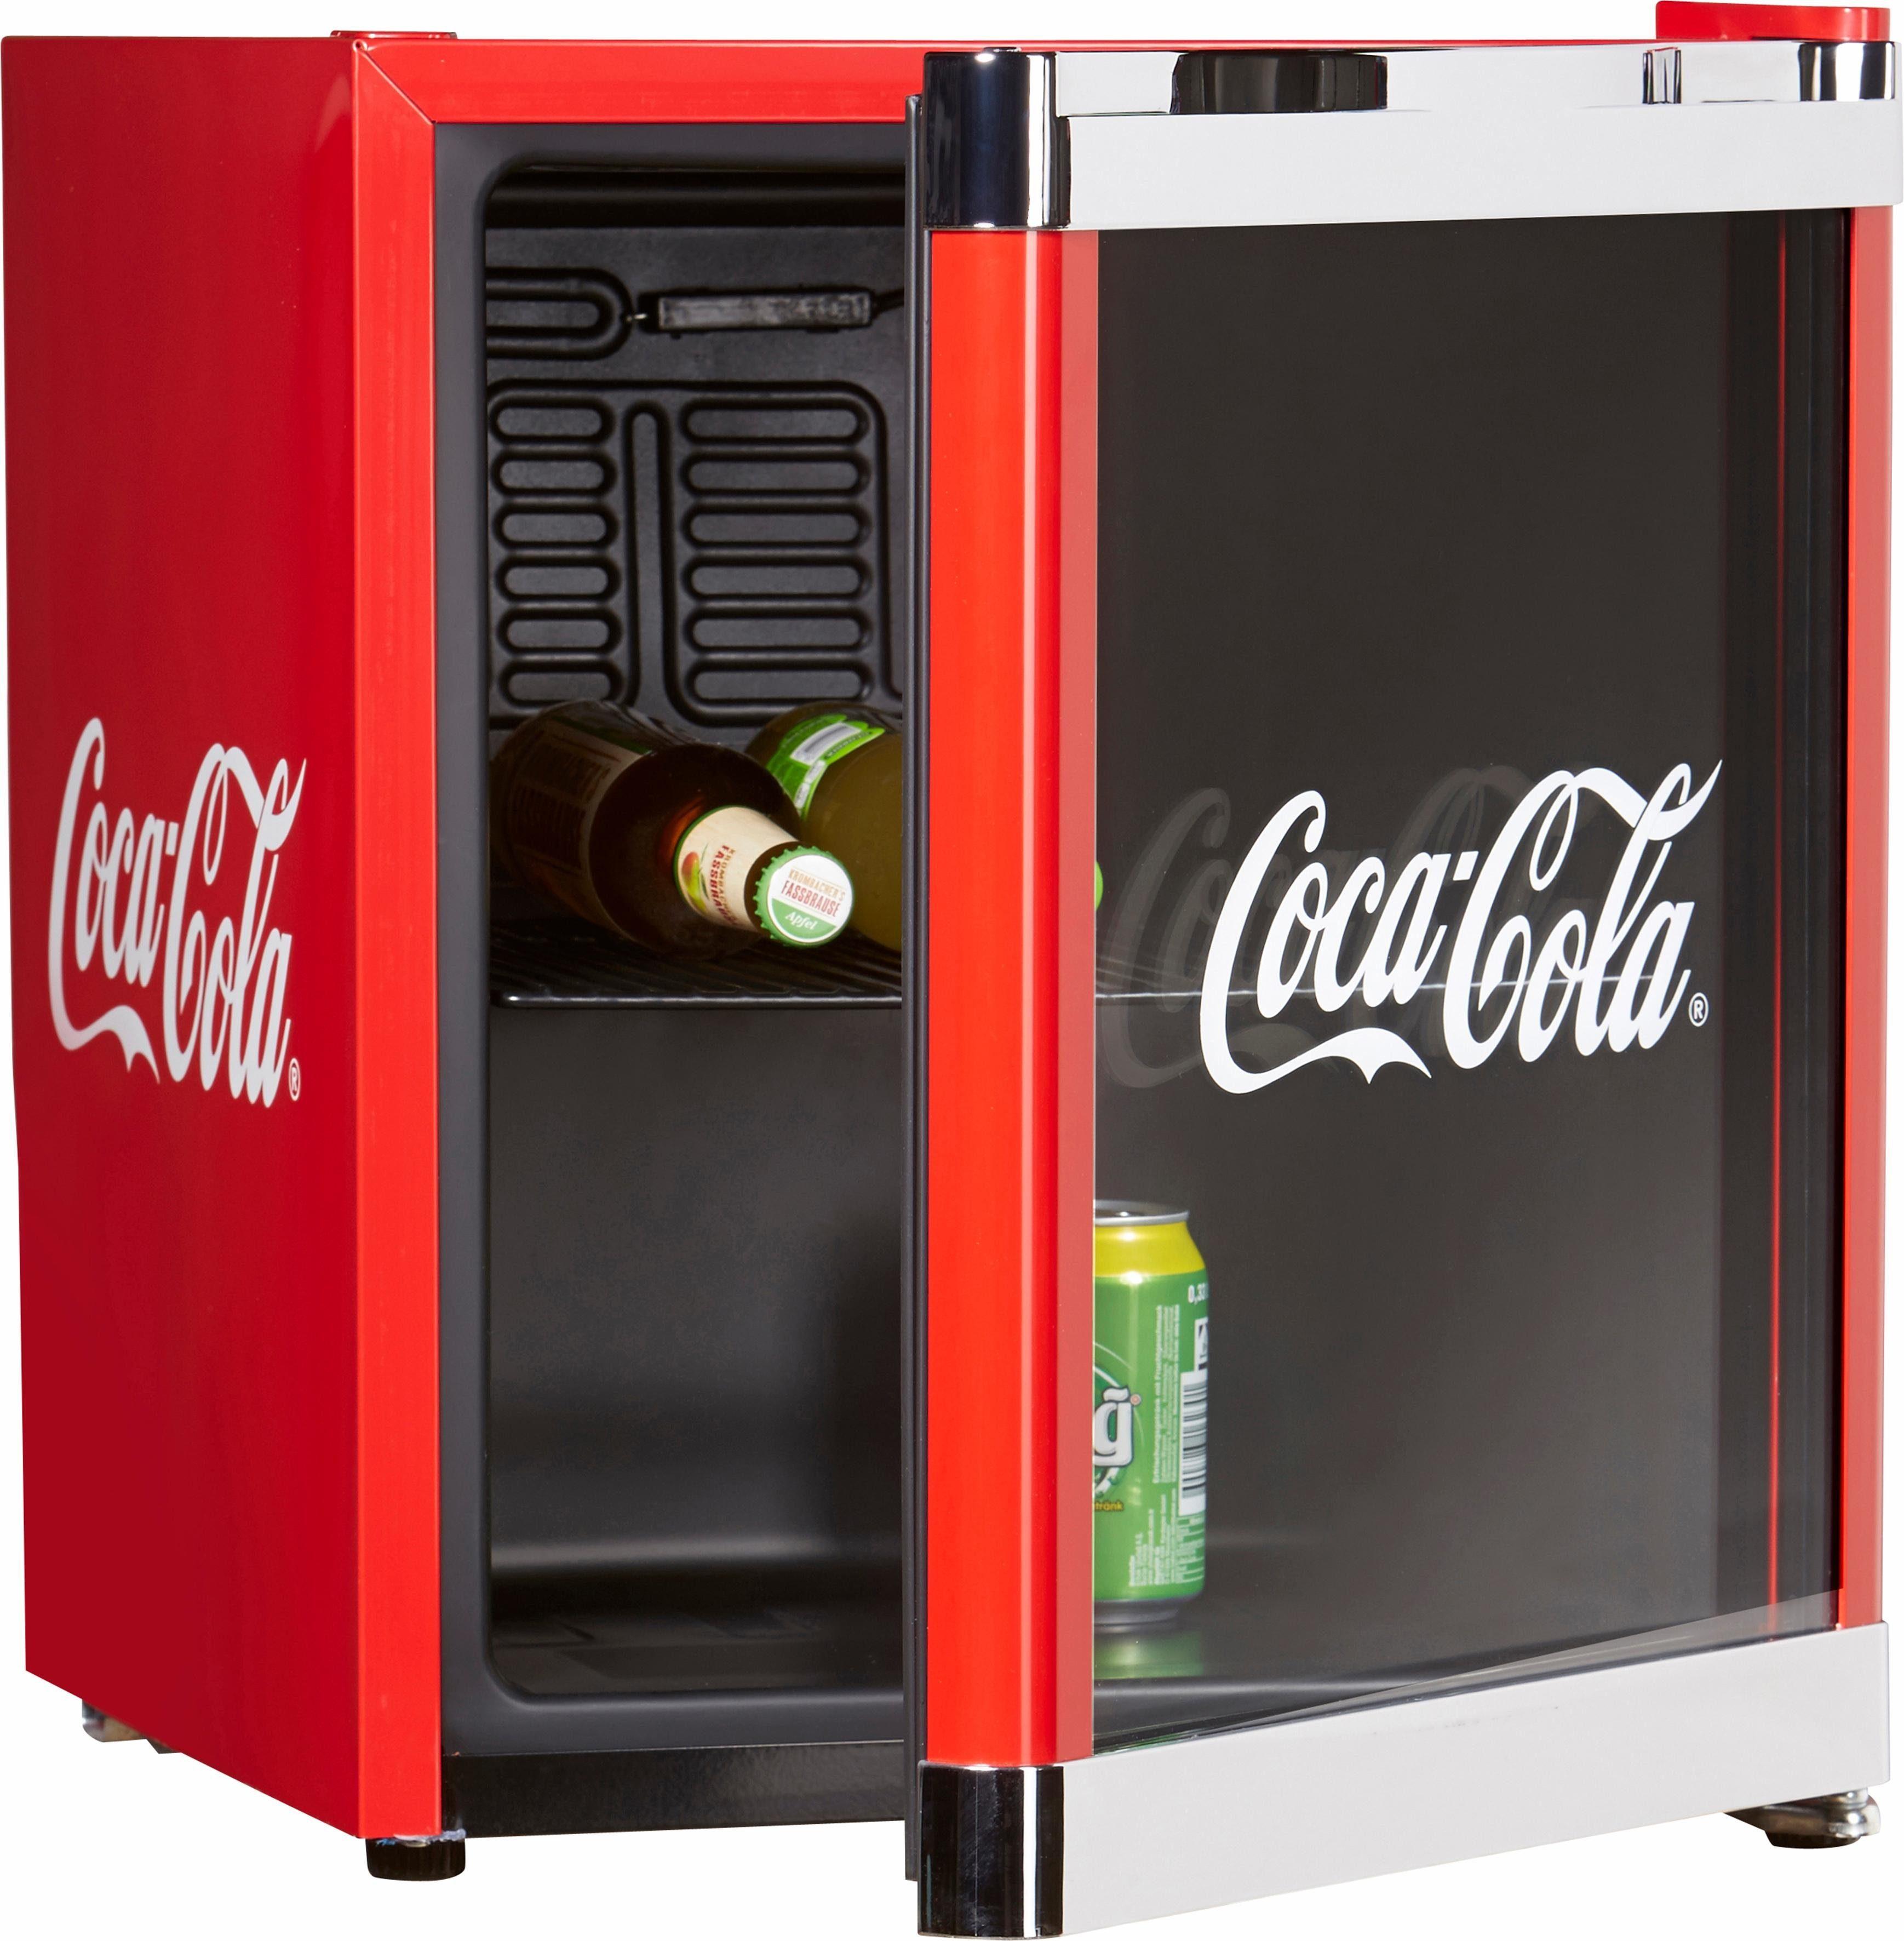 CUBES Kühlschrank CoolCube Coca-Cola, A+, 51 cm hoch